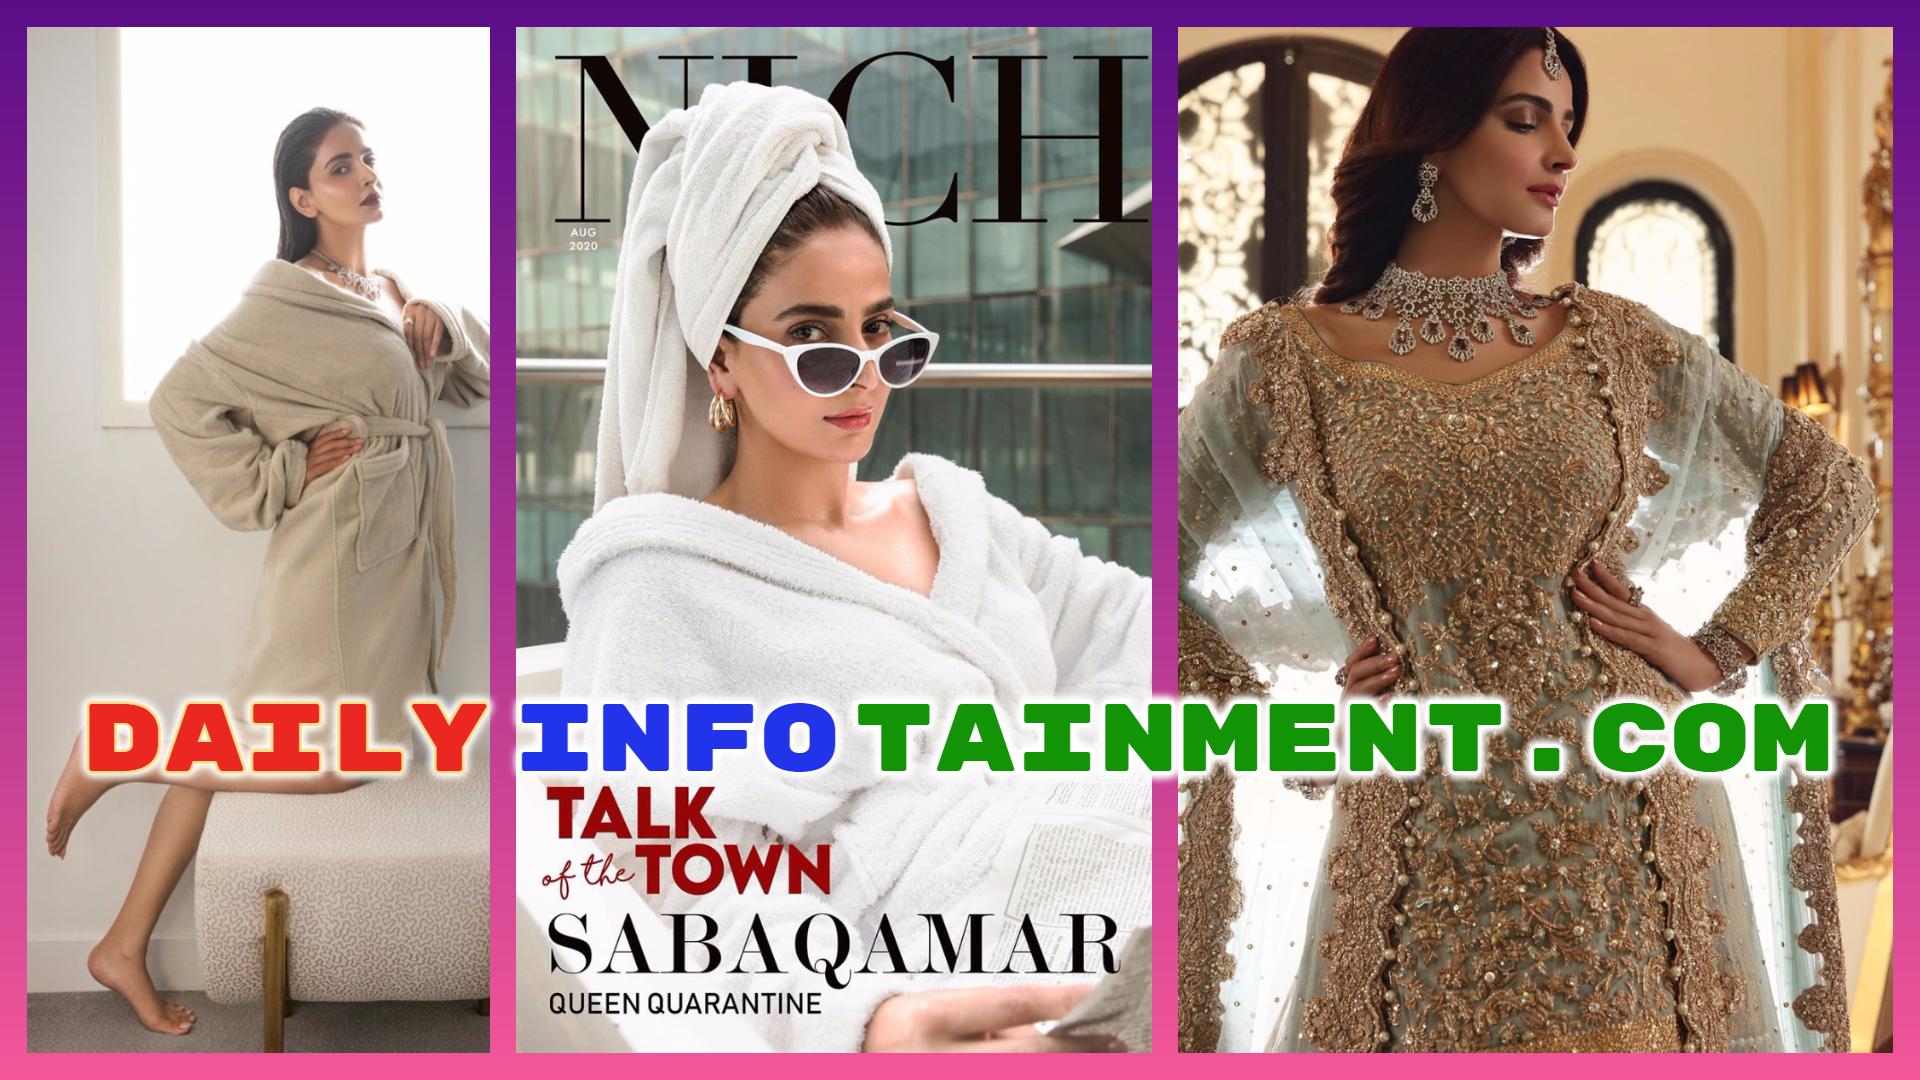 Saba Qamar New Ravishing Pictures